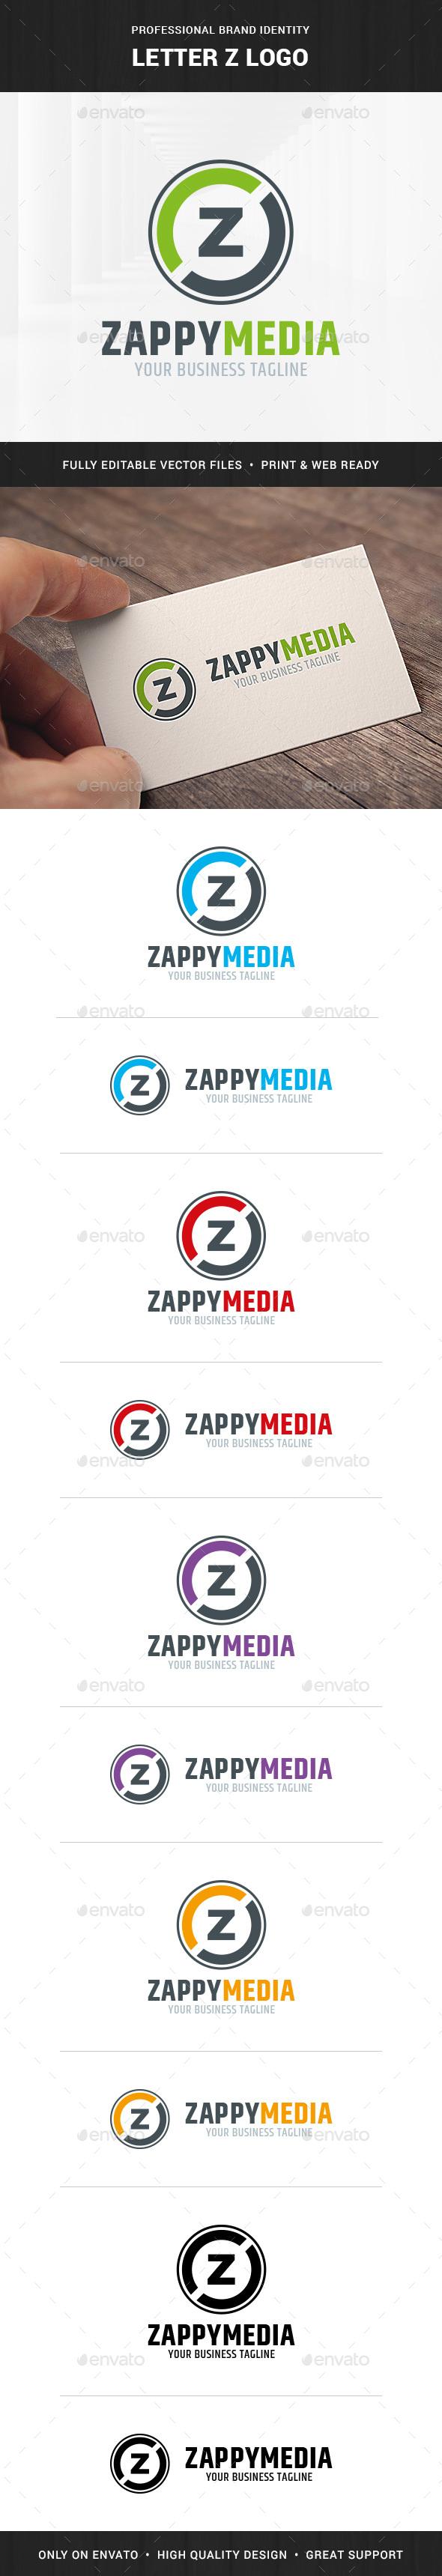 Letter Z Logo Template - Letters Logo Templates